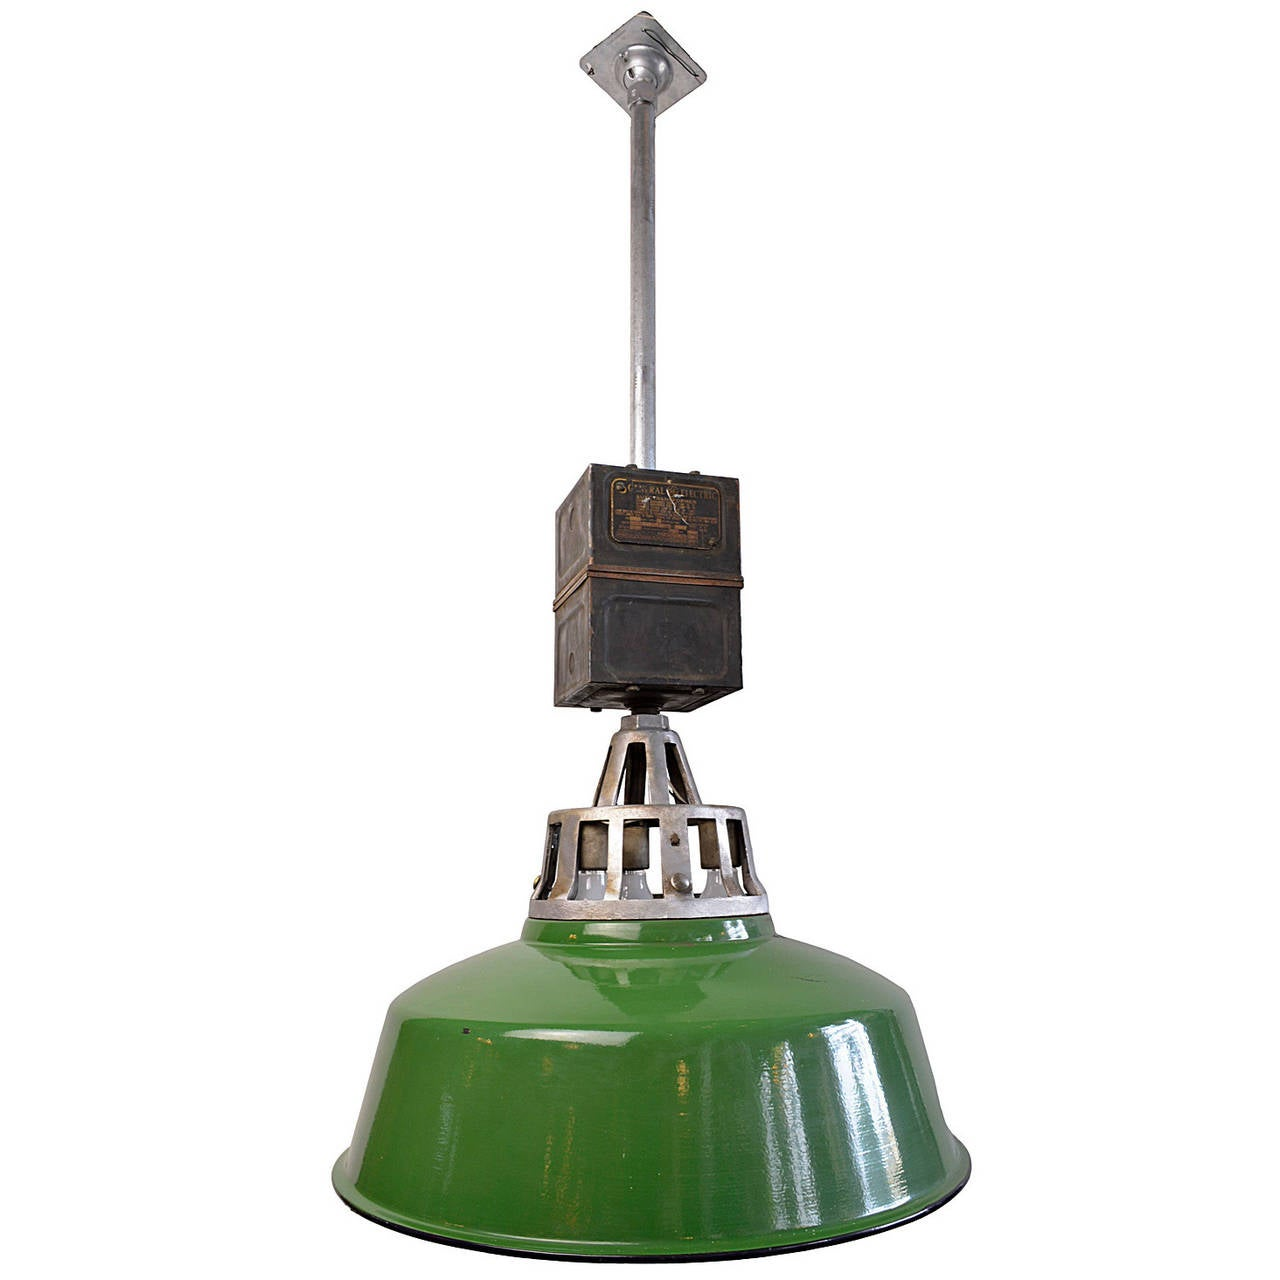 Green Enamel Warehouse Fixture With Original Transformer